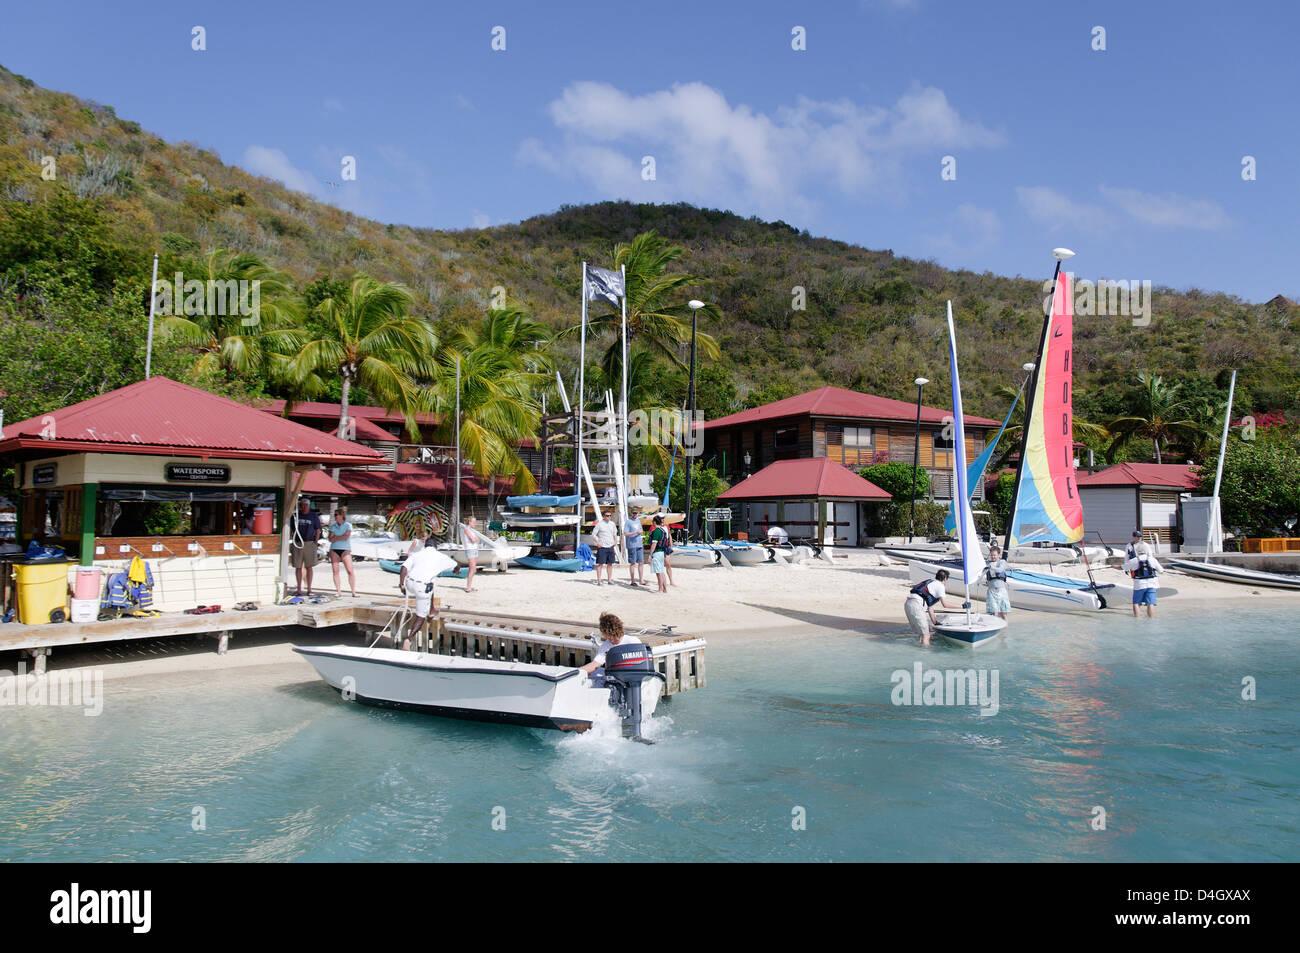 Bitter End Yachtclub, Insel Virgin Gorda, Britische Jungferninseln, West Indies, Karibik Stockbild